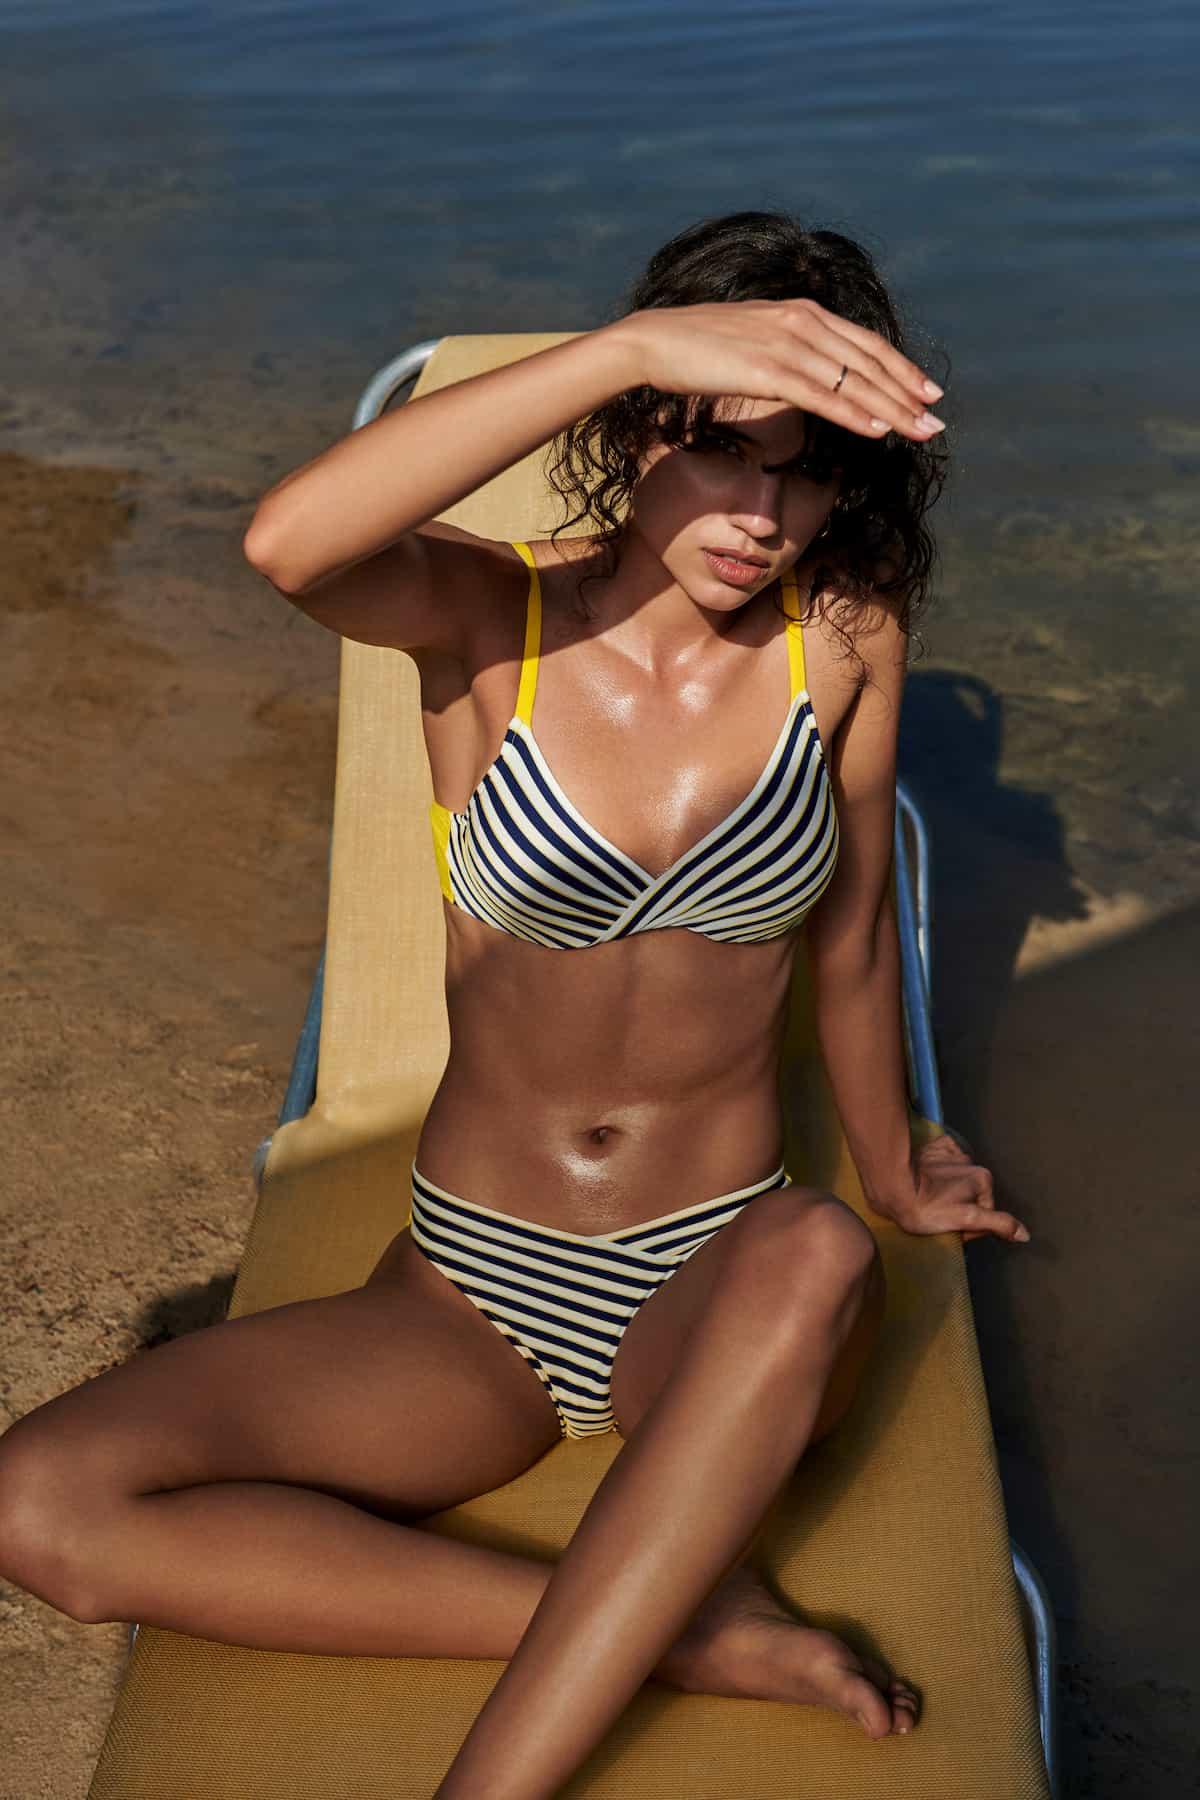 Marie Jo Swim Bademode 2021 Modell Manuela - Bikini in Wickel-Optik